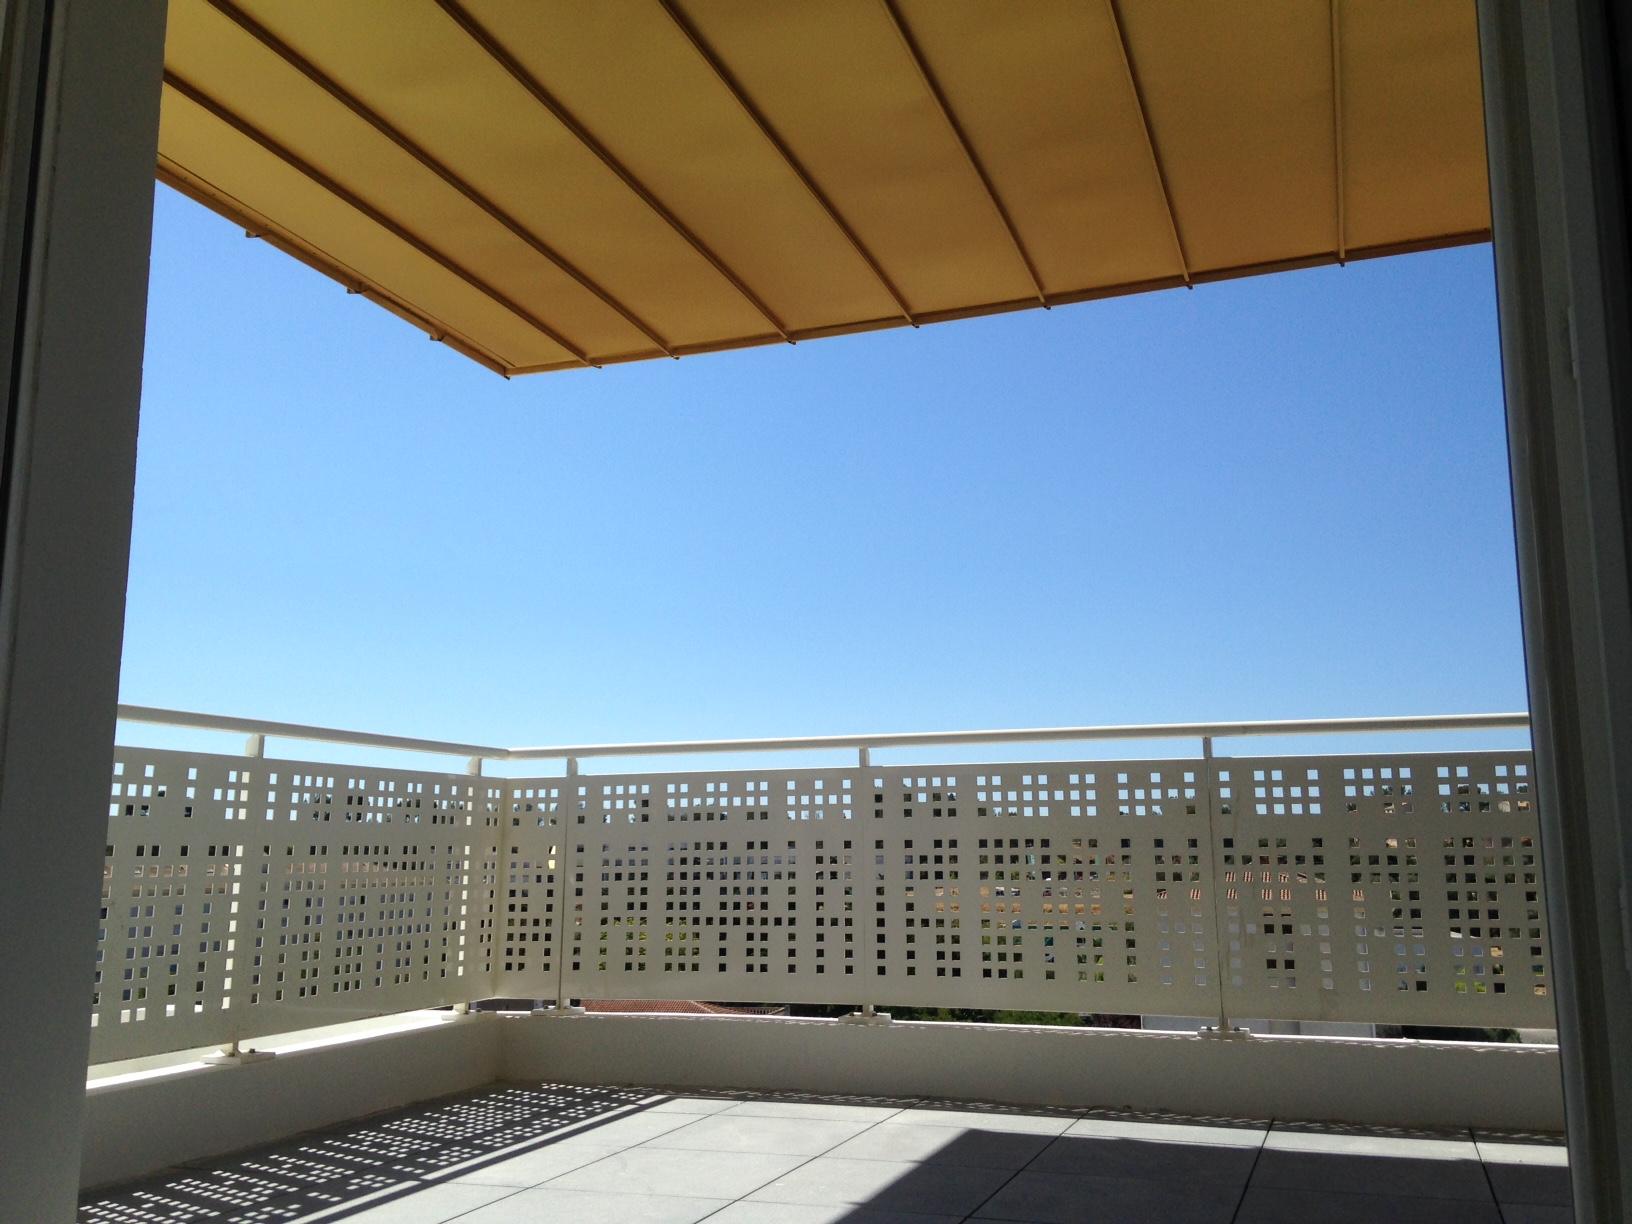 Terrasse - 87 Logements La Valette par AAPL architecte DPLG VAR